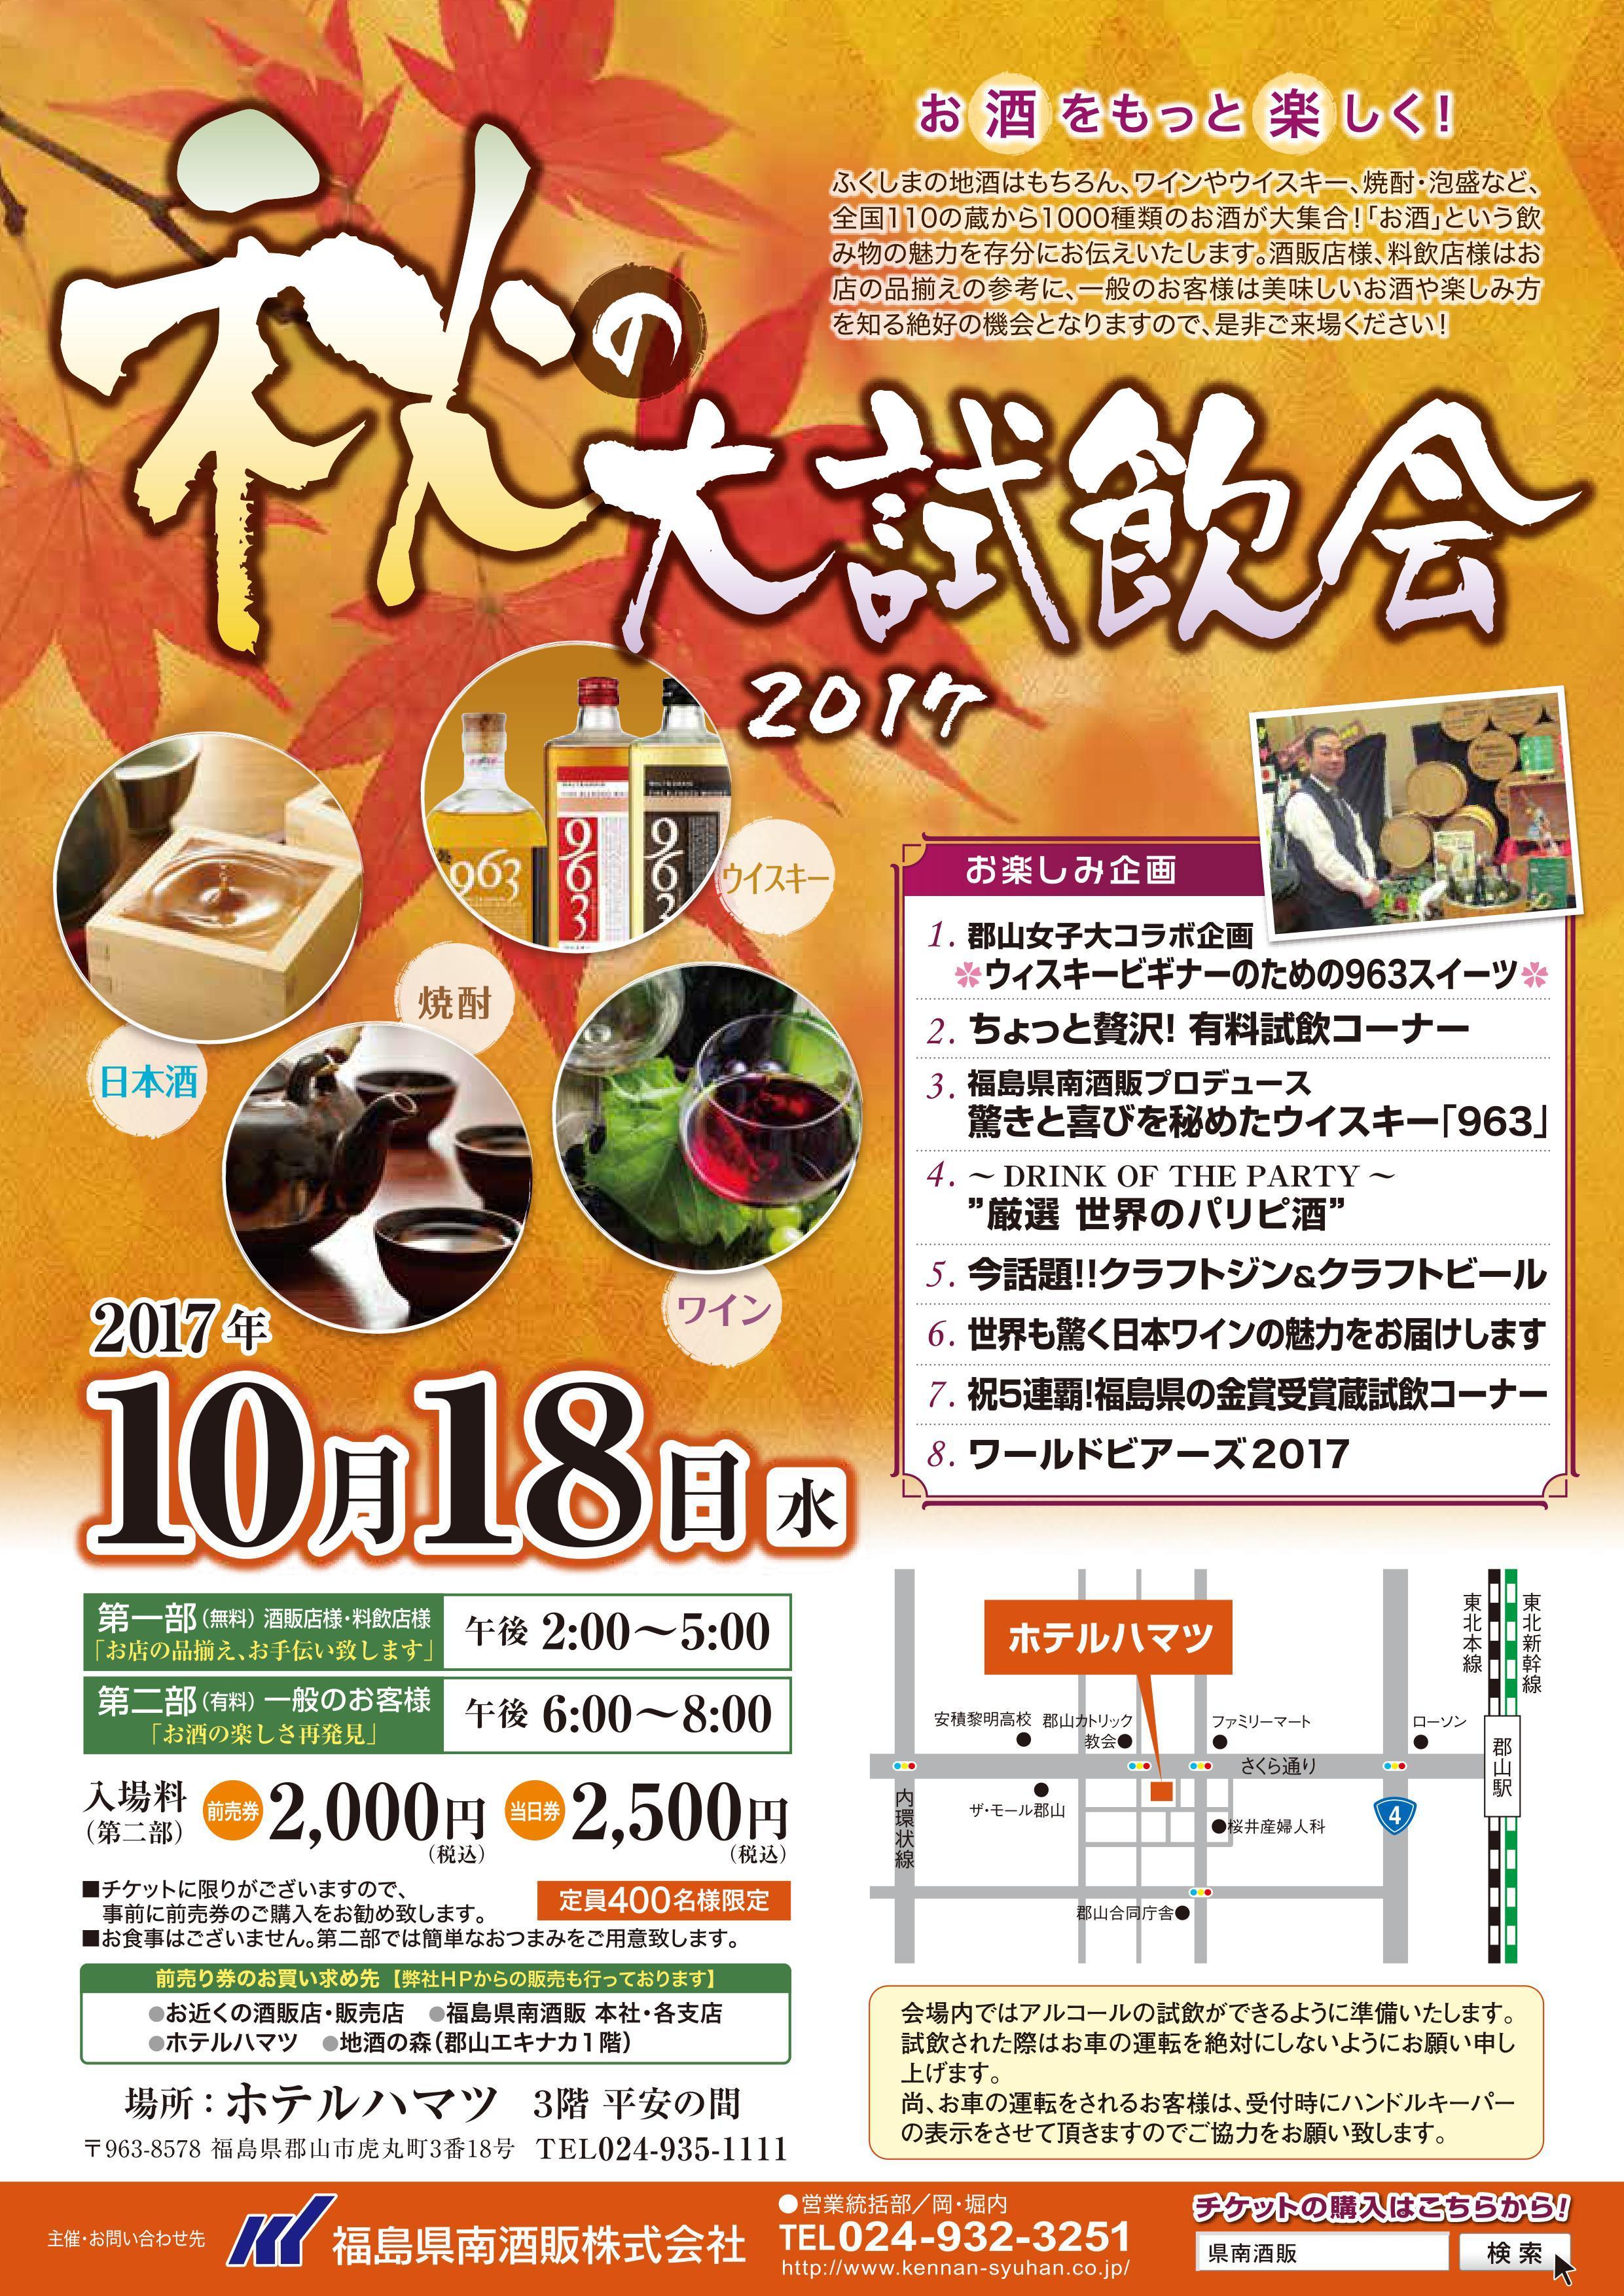 event-20171018.jpg